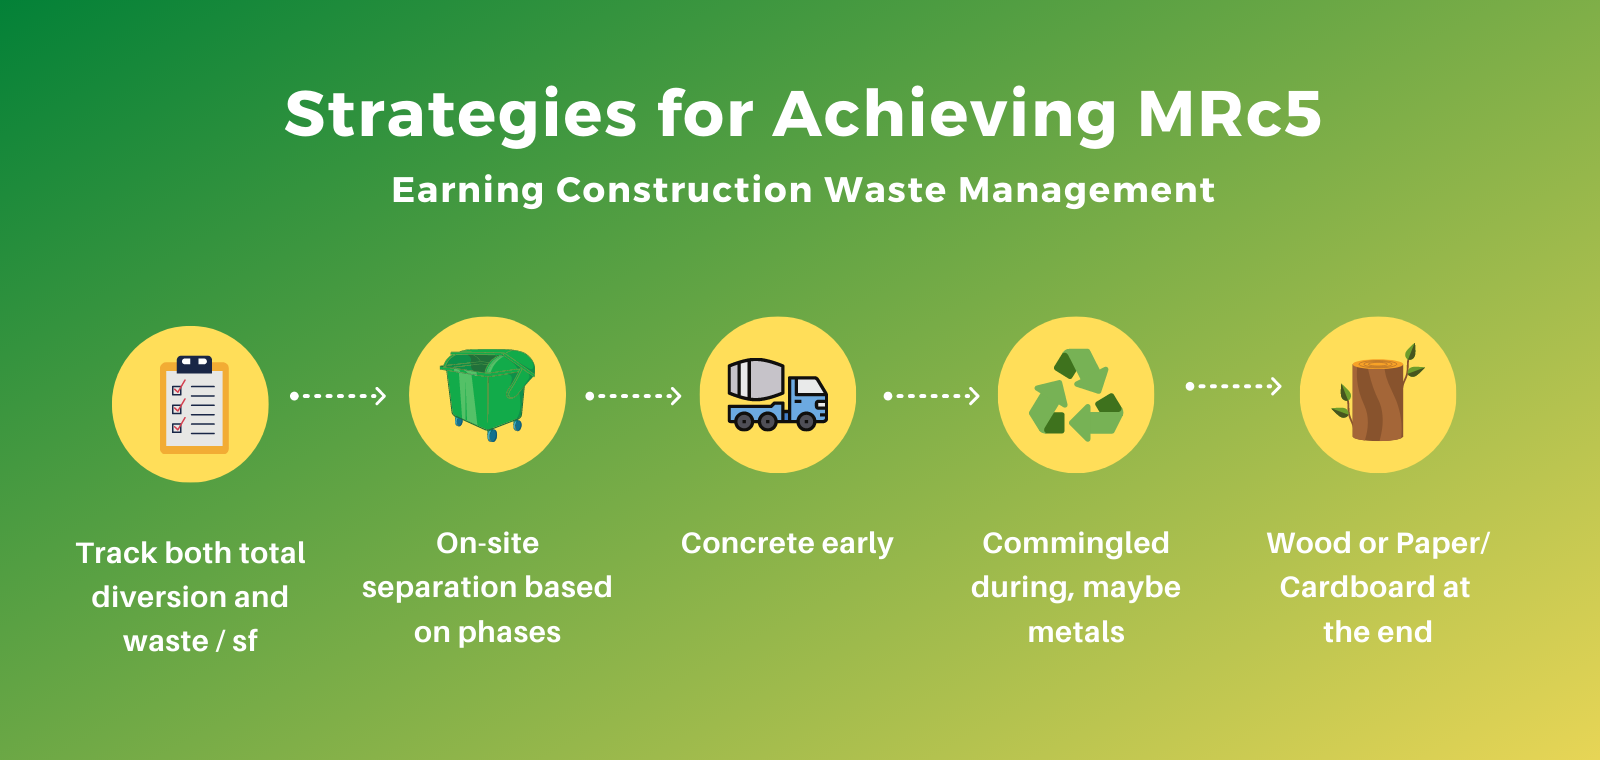 MRc5 construction waste management LEED v4 strategies